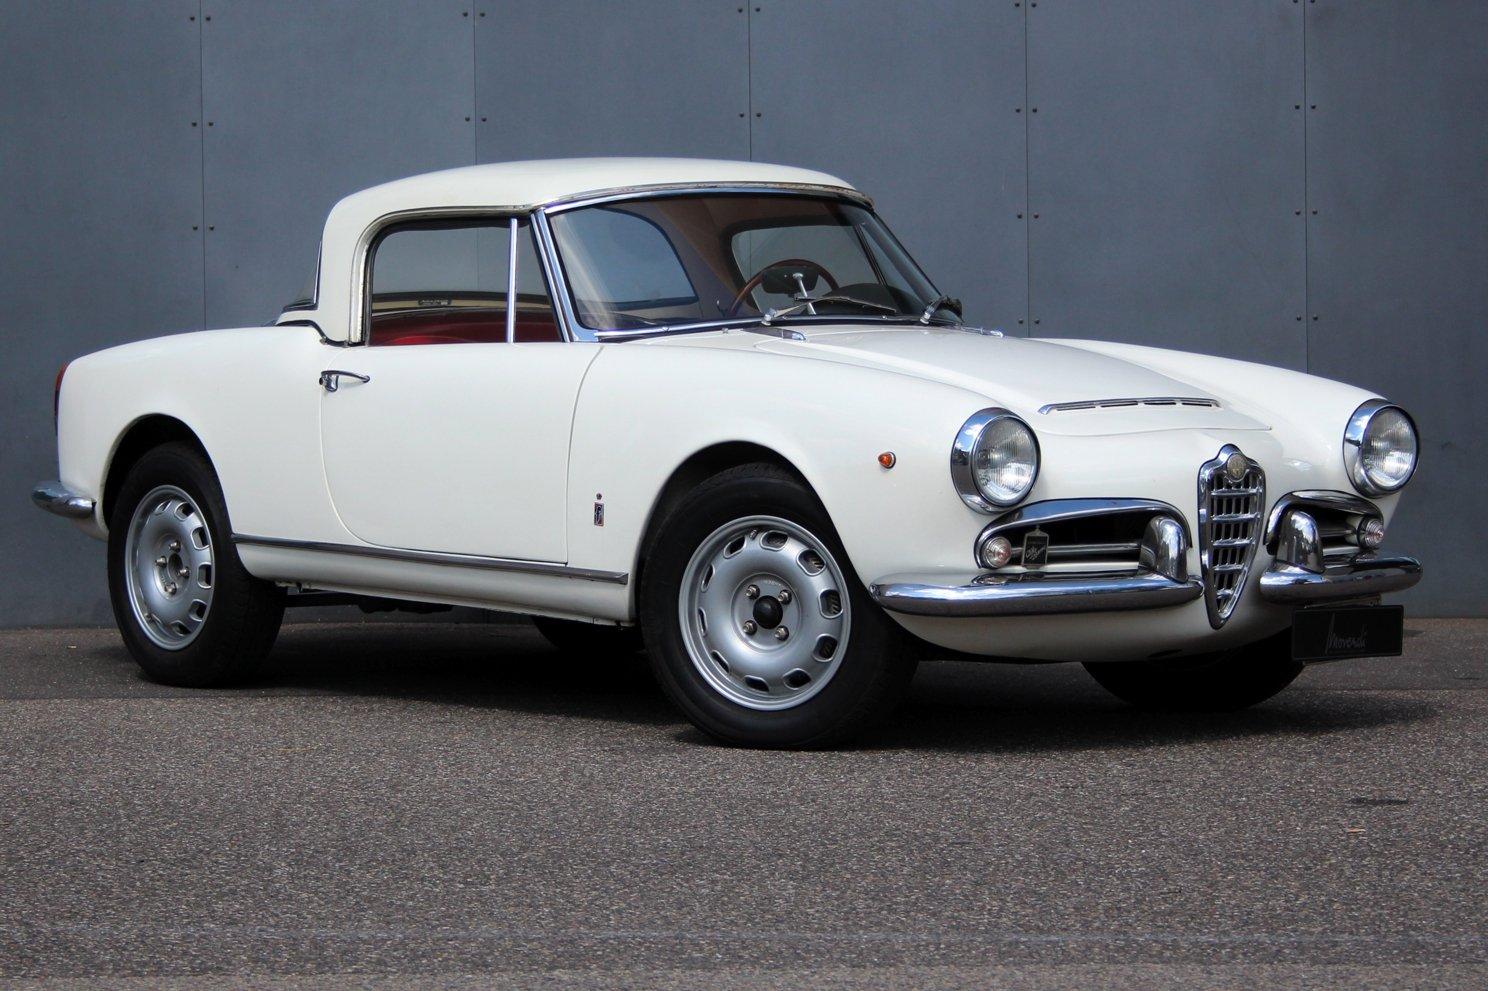 1963 Alfa Romeo Giulia Spider Vintage Car For Sale